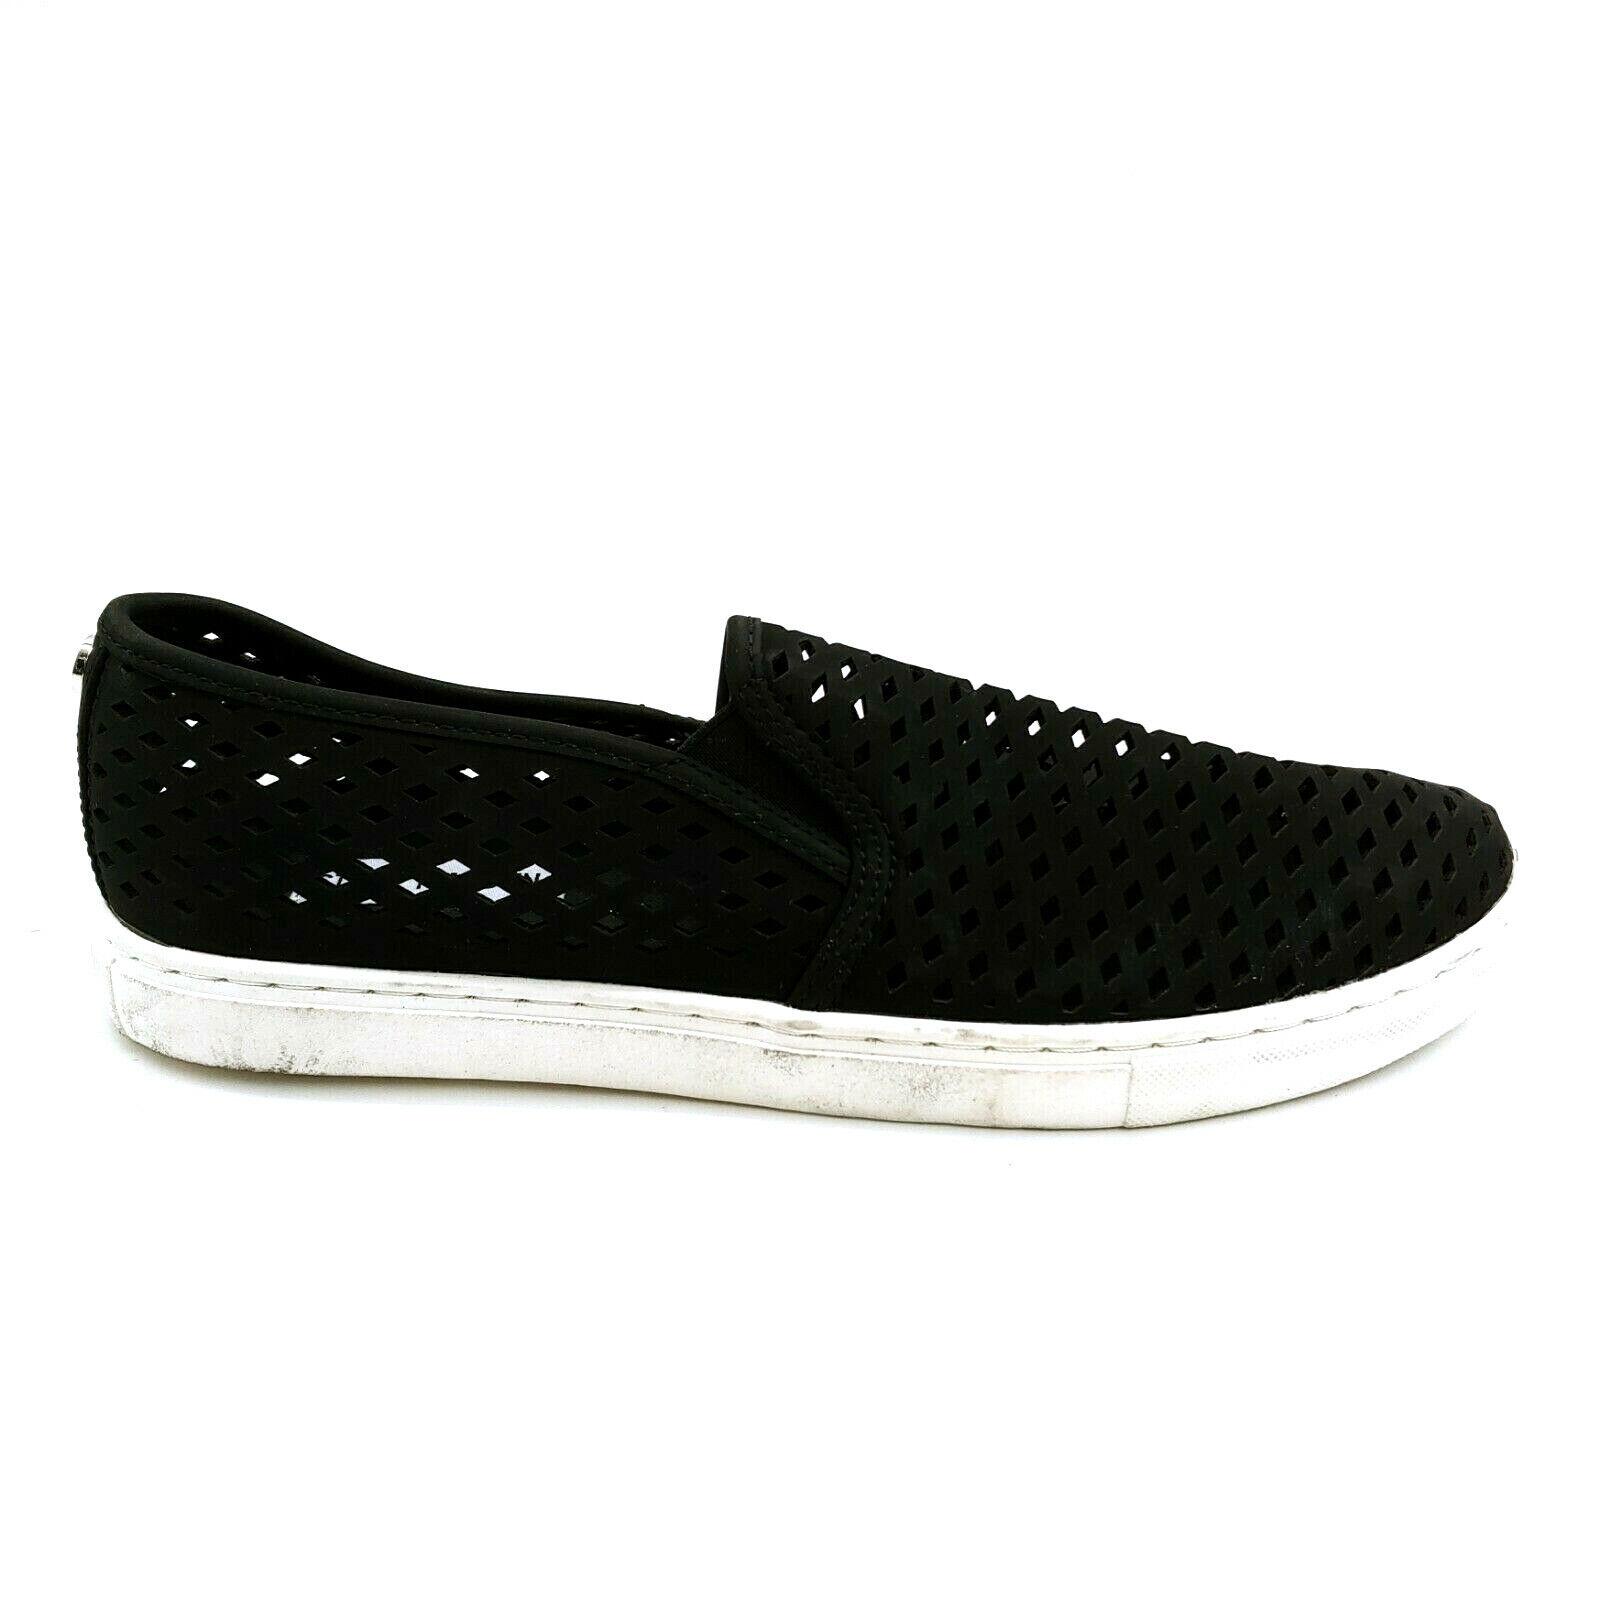 Steve Madden Womans Zeena Slip On Loafer Style Sneaker Black Perforated Sz 12 M